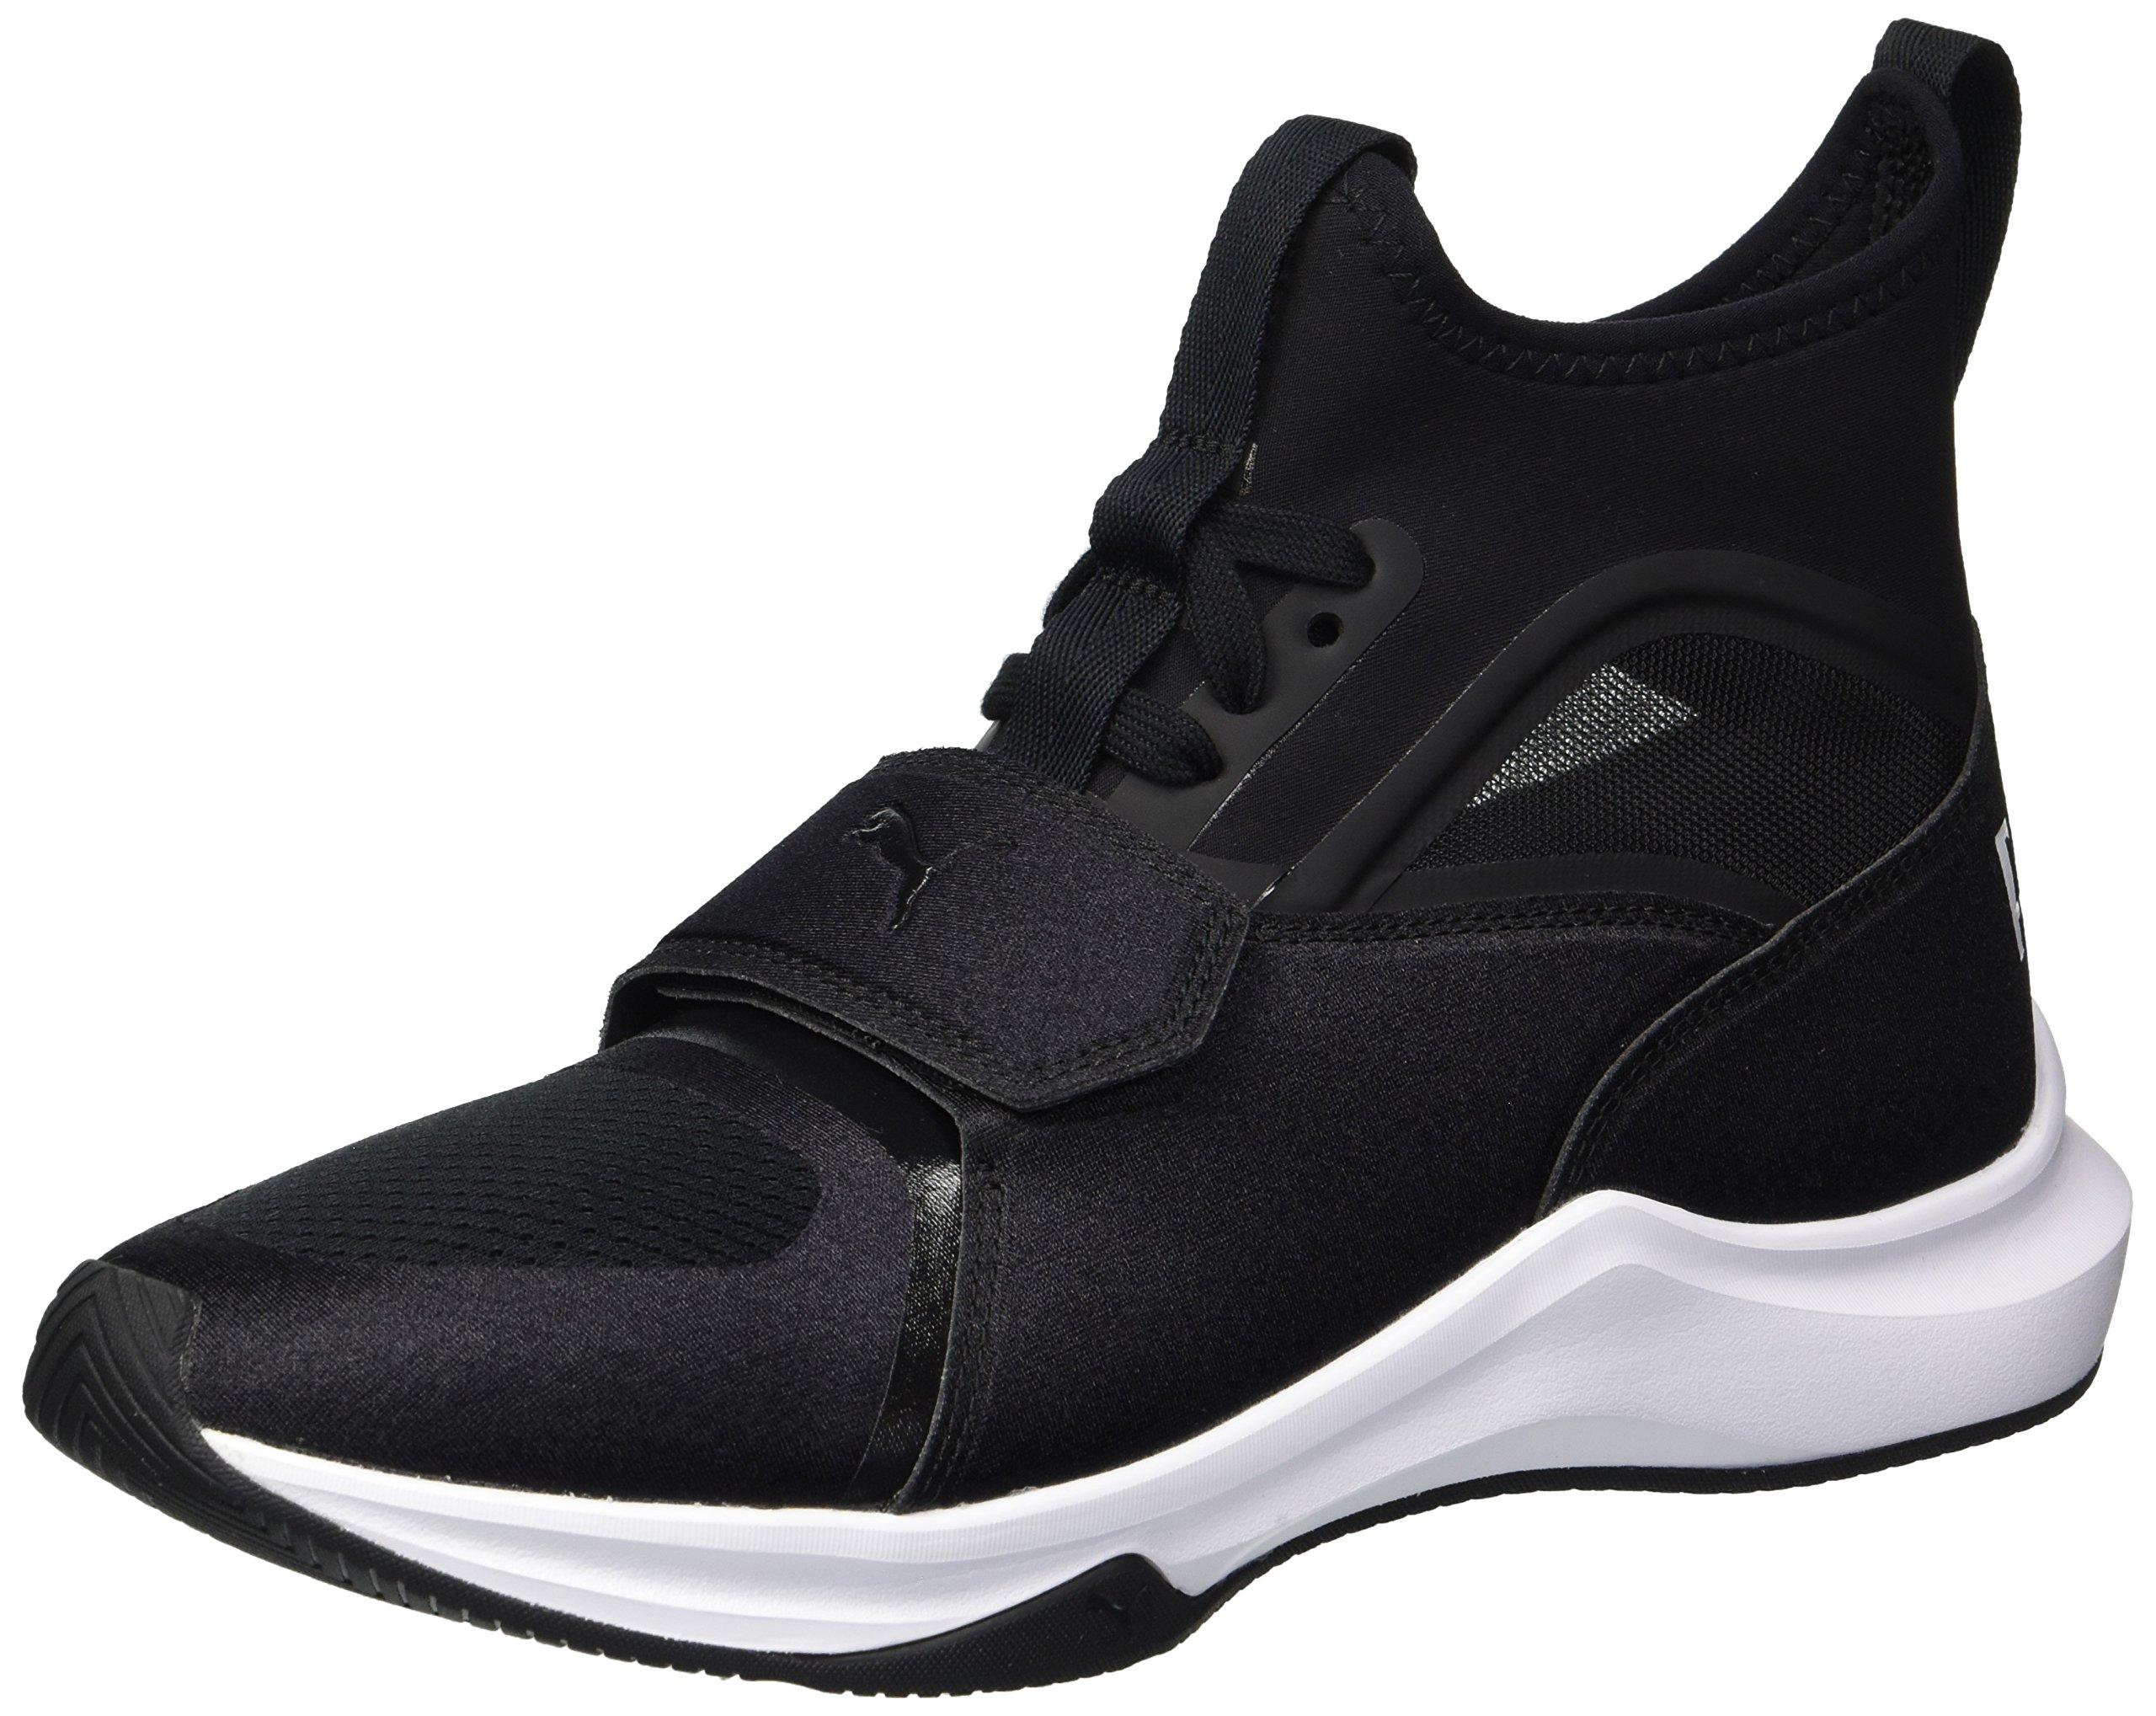 PUMA Women's Phenom Wn Sneaker, Black White, 7.5 M US